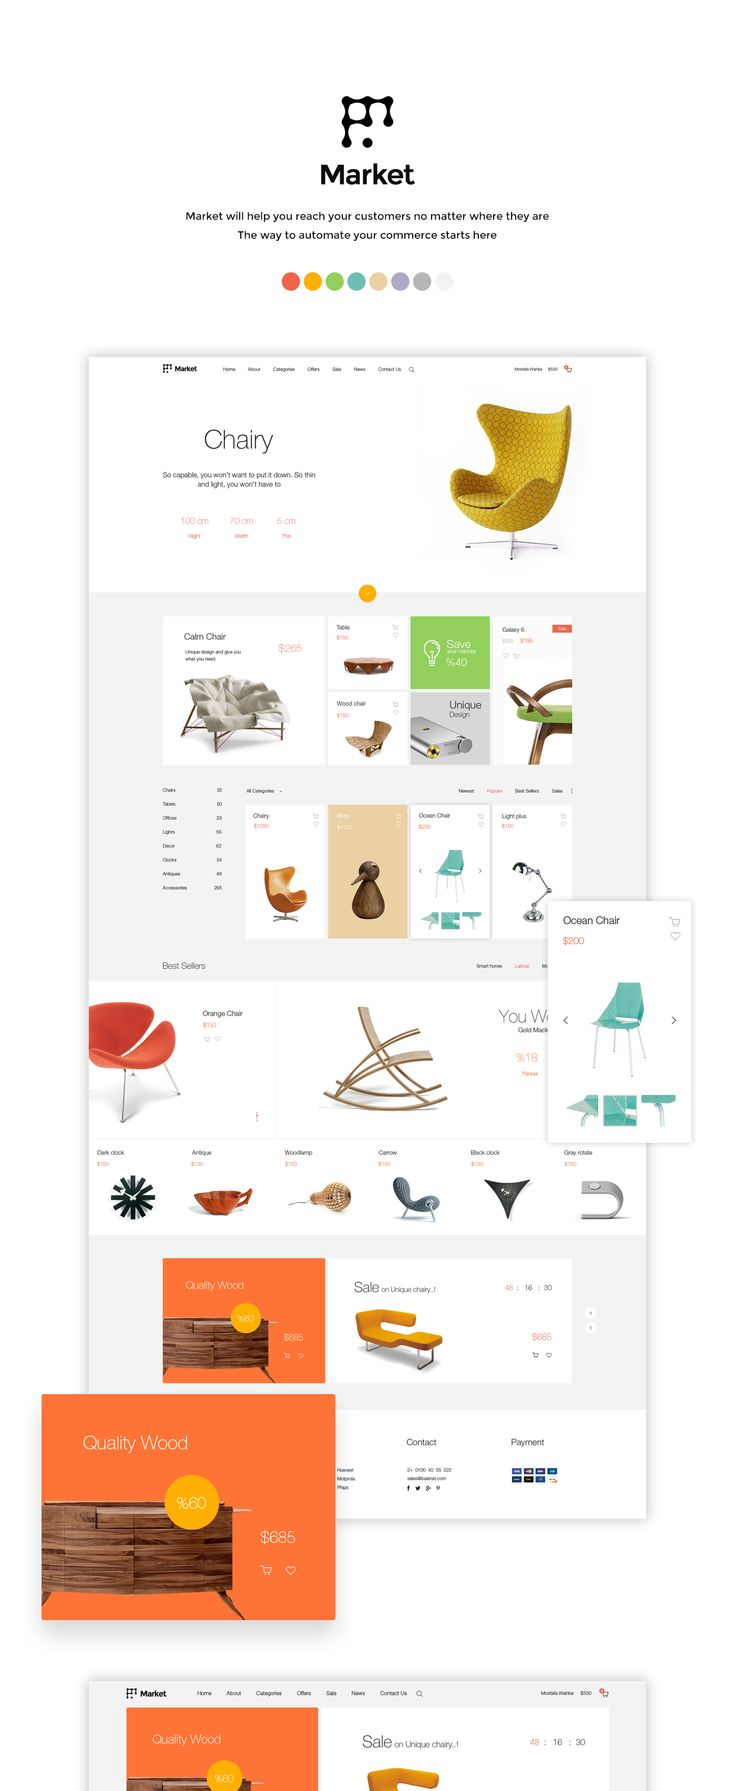 Market is an elegant online store solution on Behance